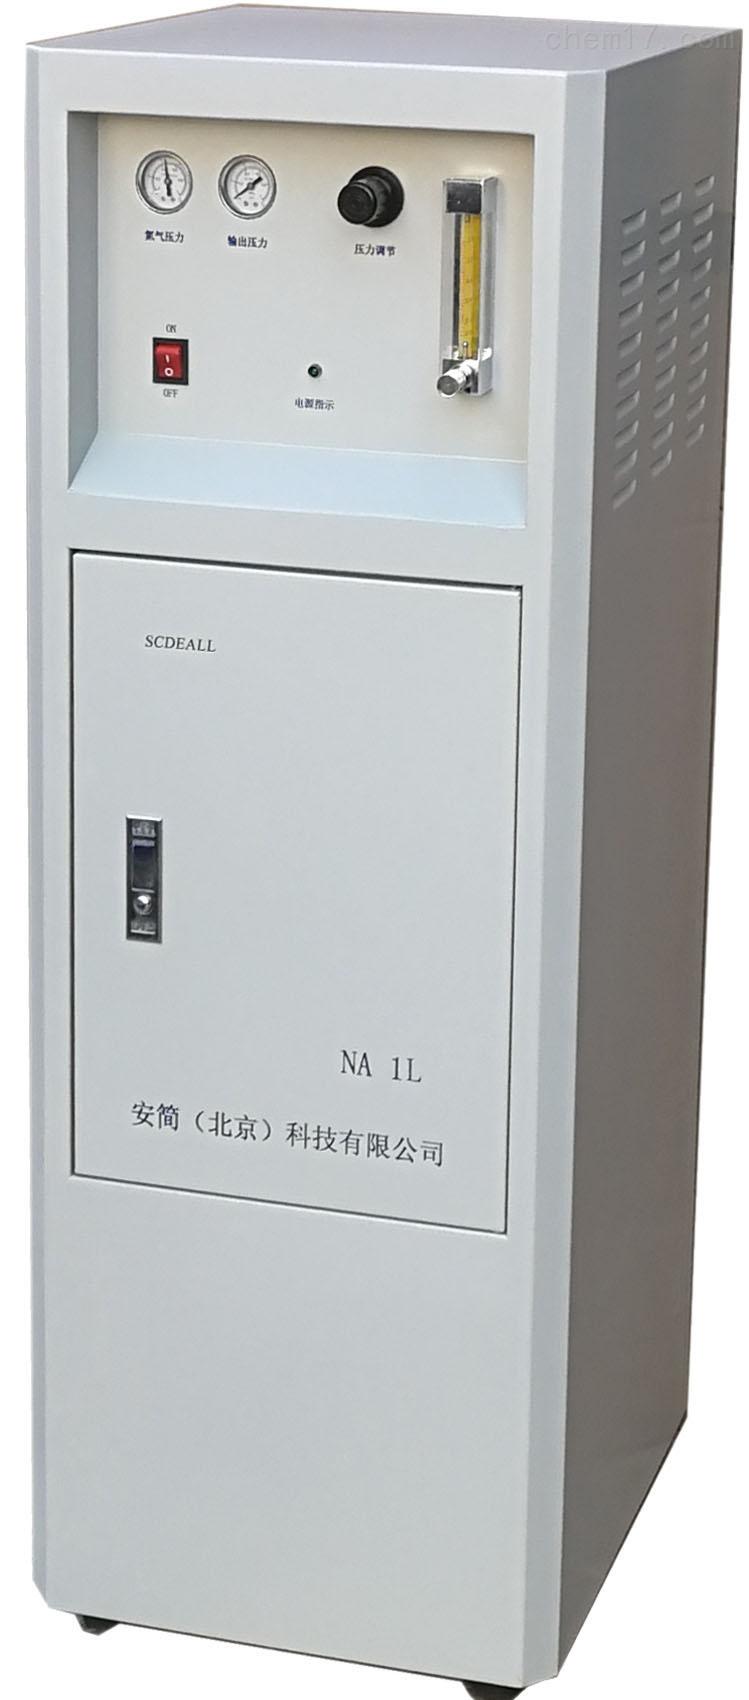 NA1L型高纯氮气发生器(安简)